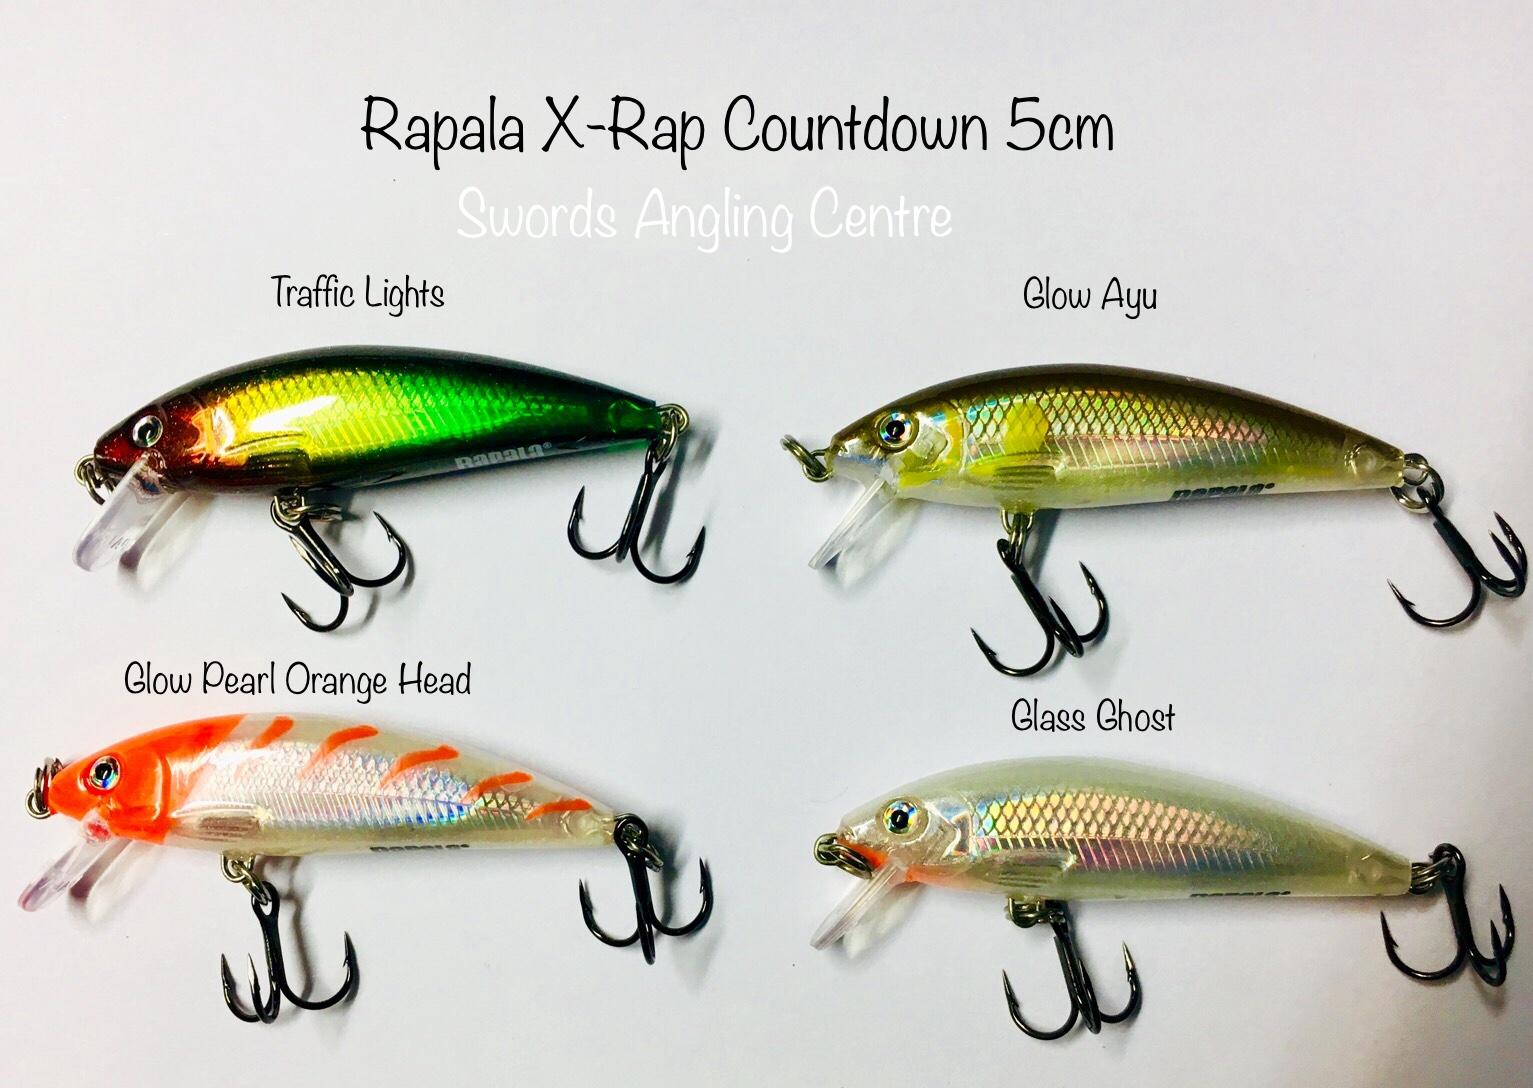 Rapala Countdown Lure 5/cm